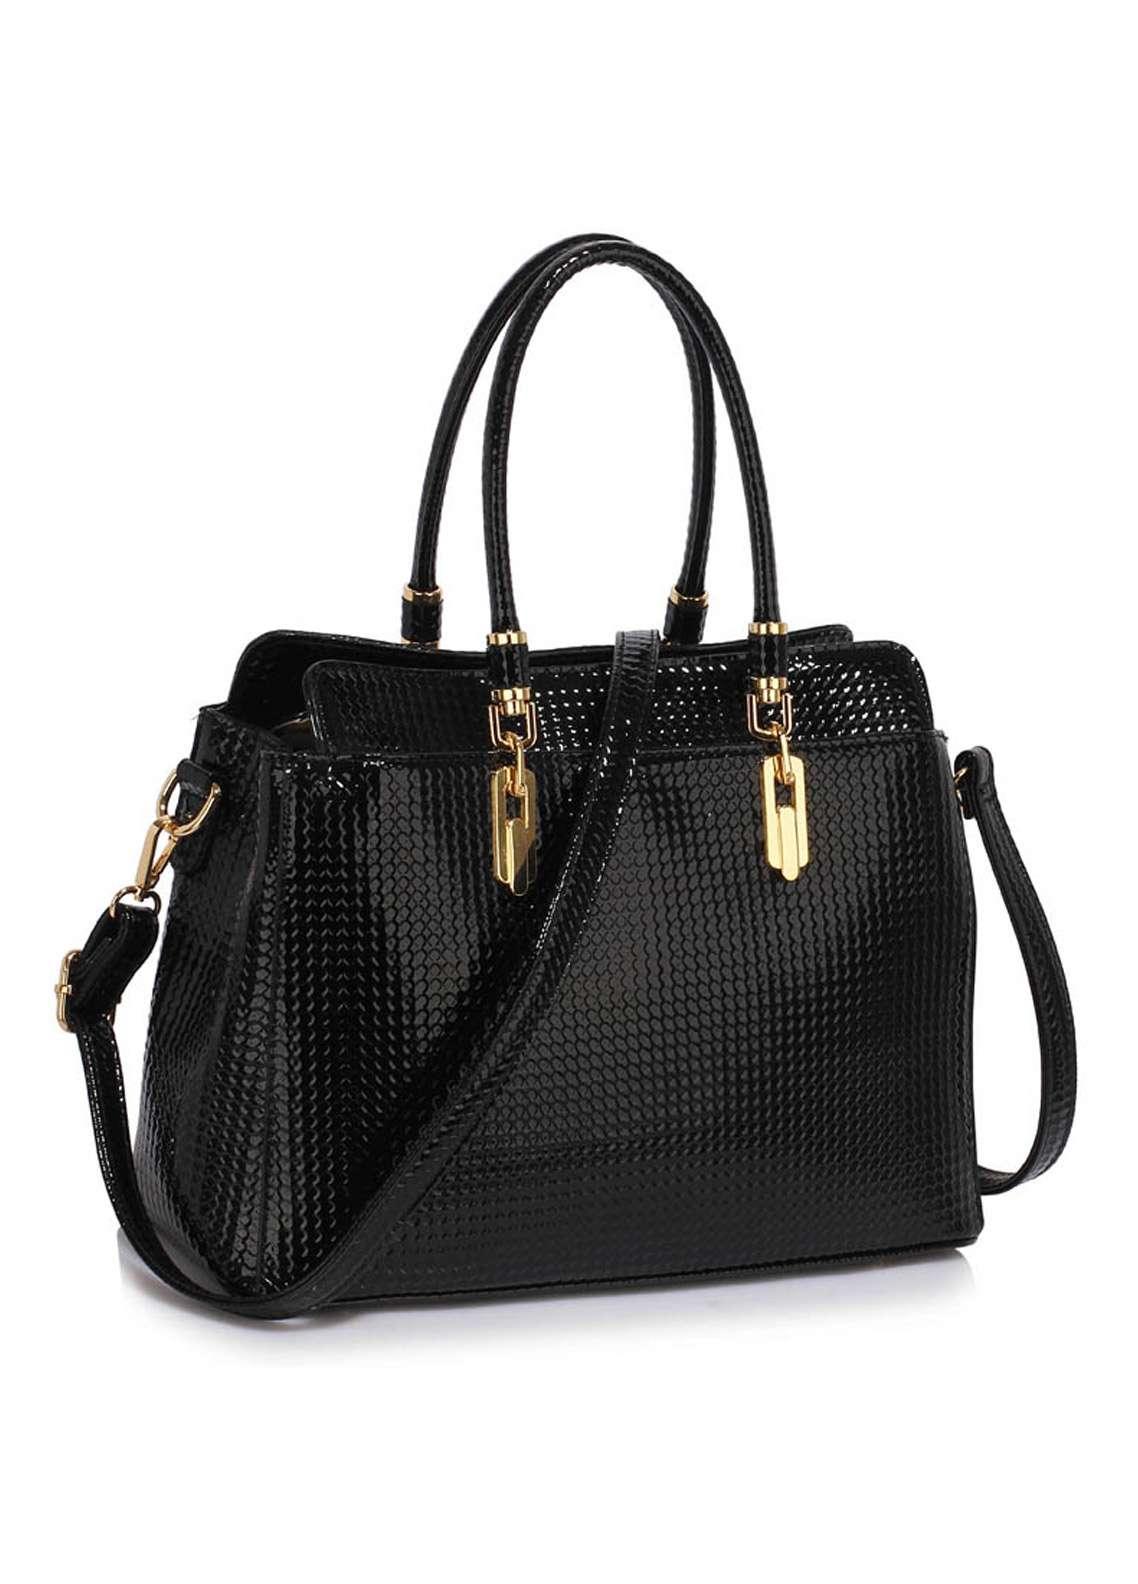 Leesun London Faux Leather Satchels Bags for Women Black